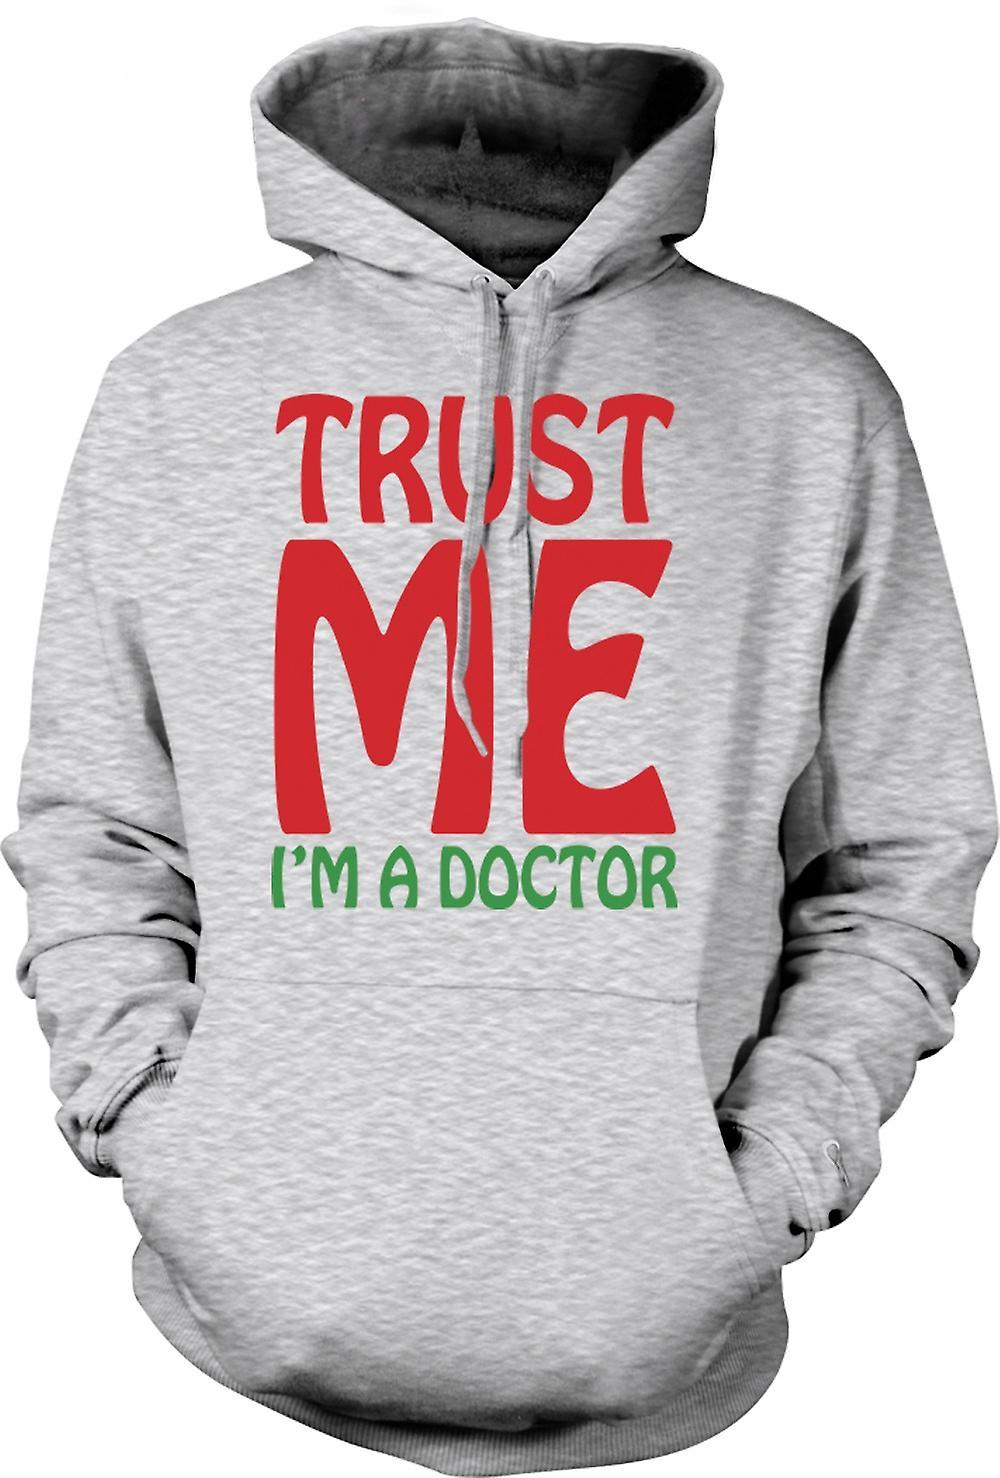 Mens-Hoodie - Vertrau mir ich bin ein Arzt - lustig